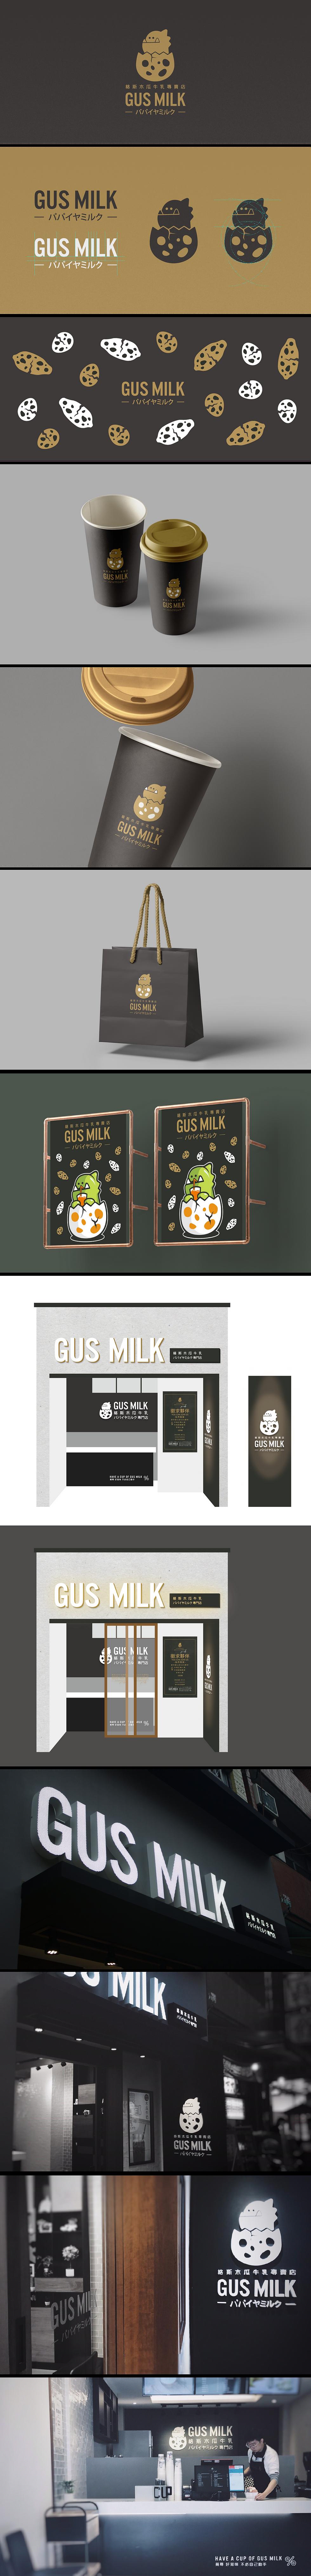 GUS MILK 品牌規劃_工作區域 1.png